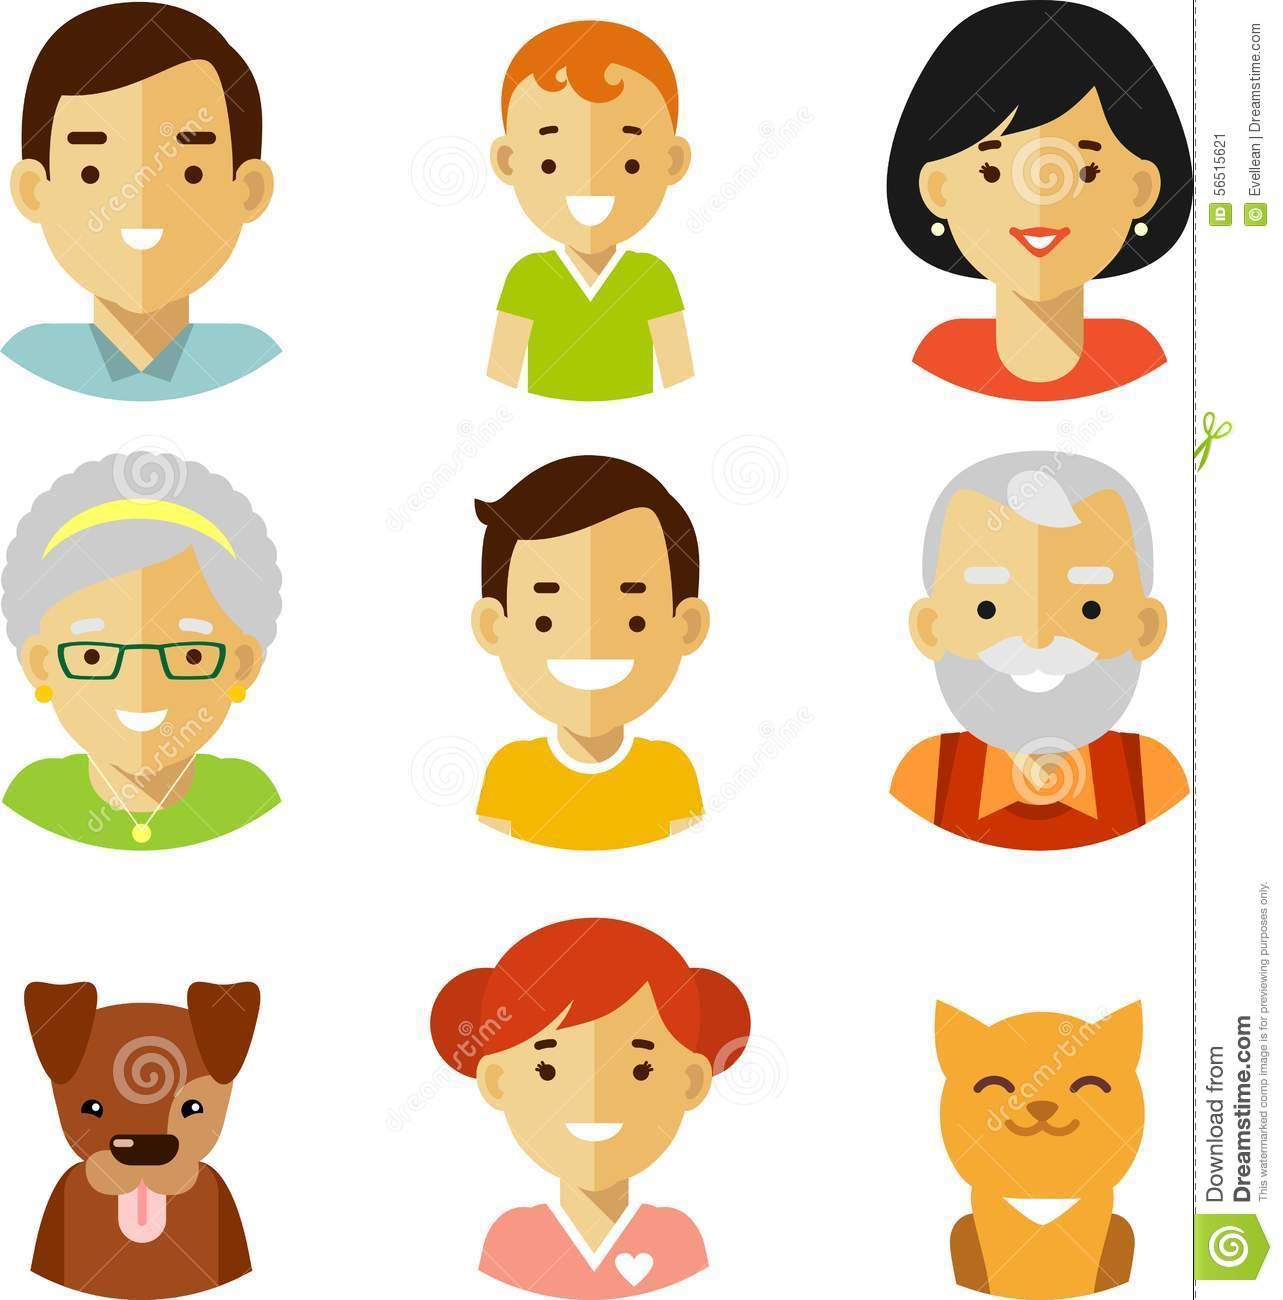 Clip Art of a Family Members.